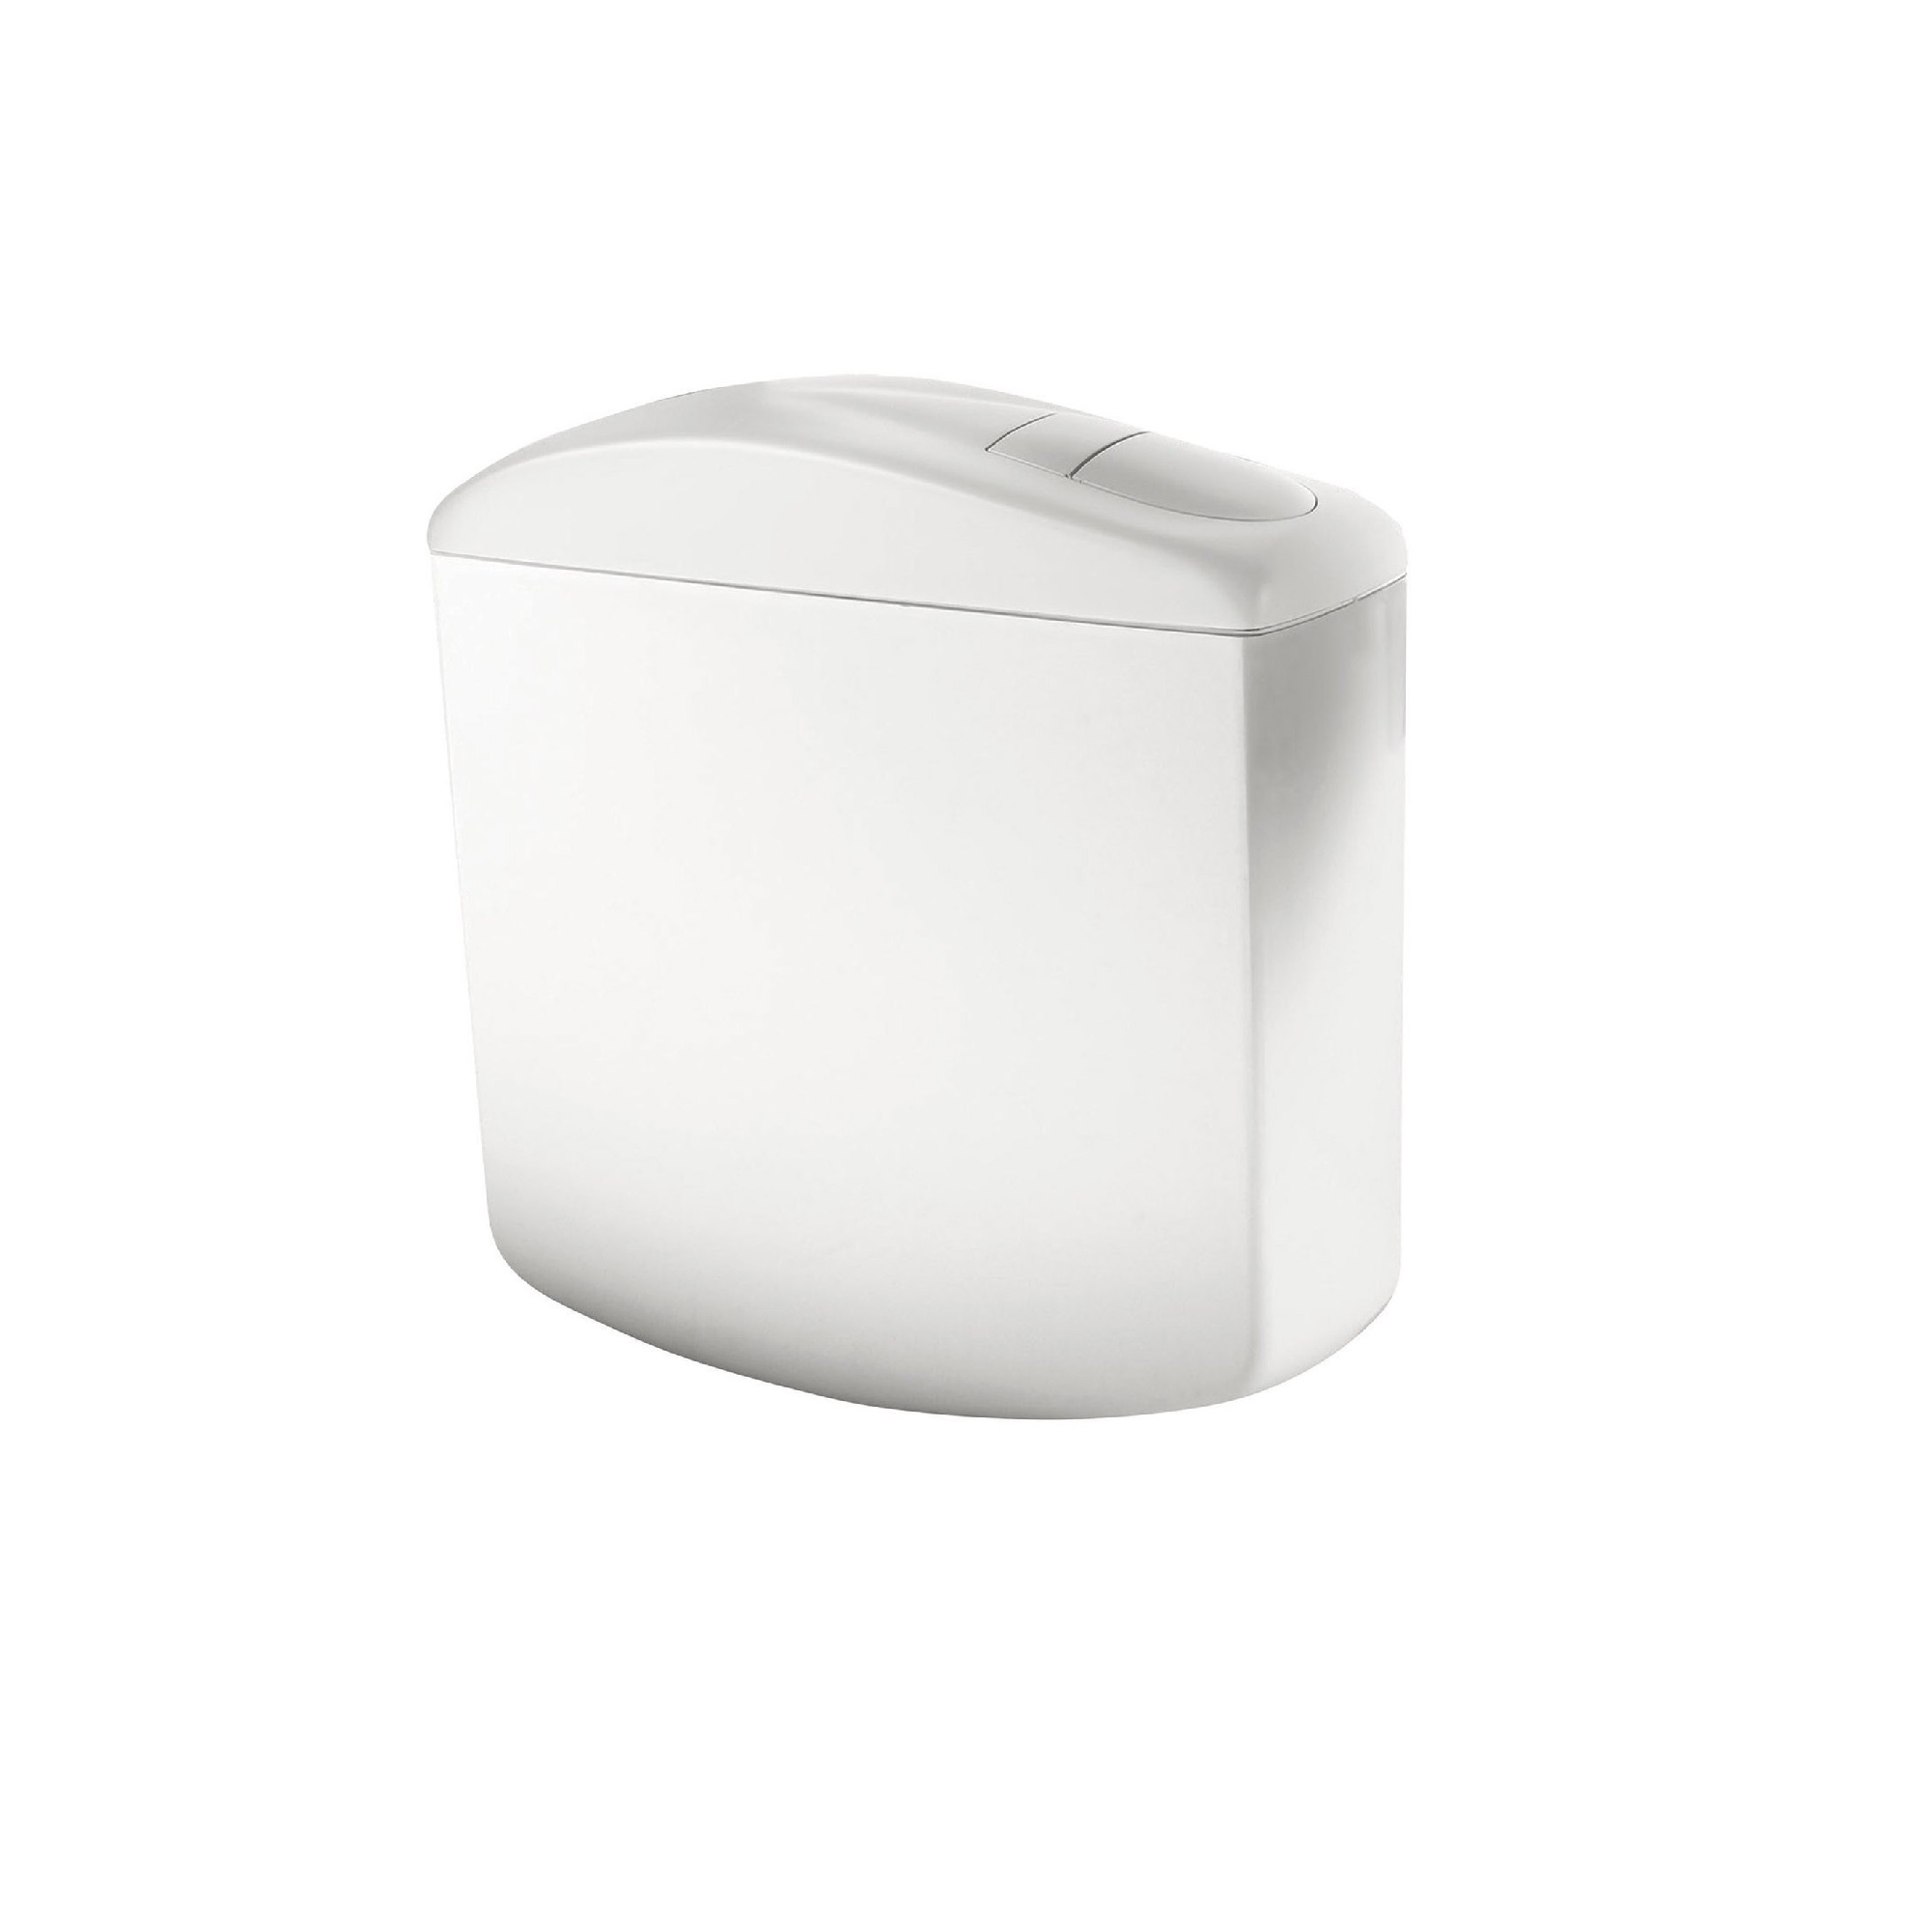 kariba cassetta esterna wc  cassetta di risciacquo wc kariba a zaino esterna bassa-media posizione